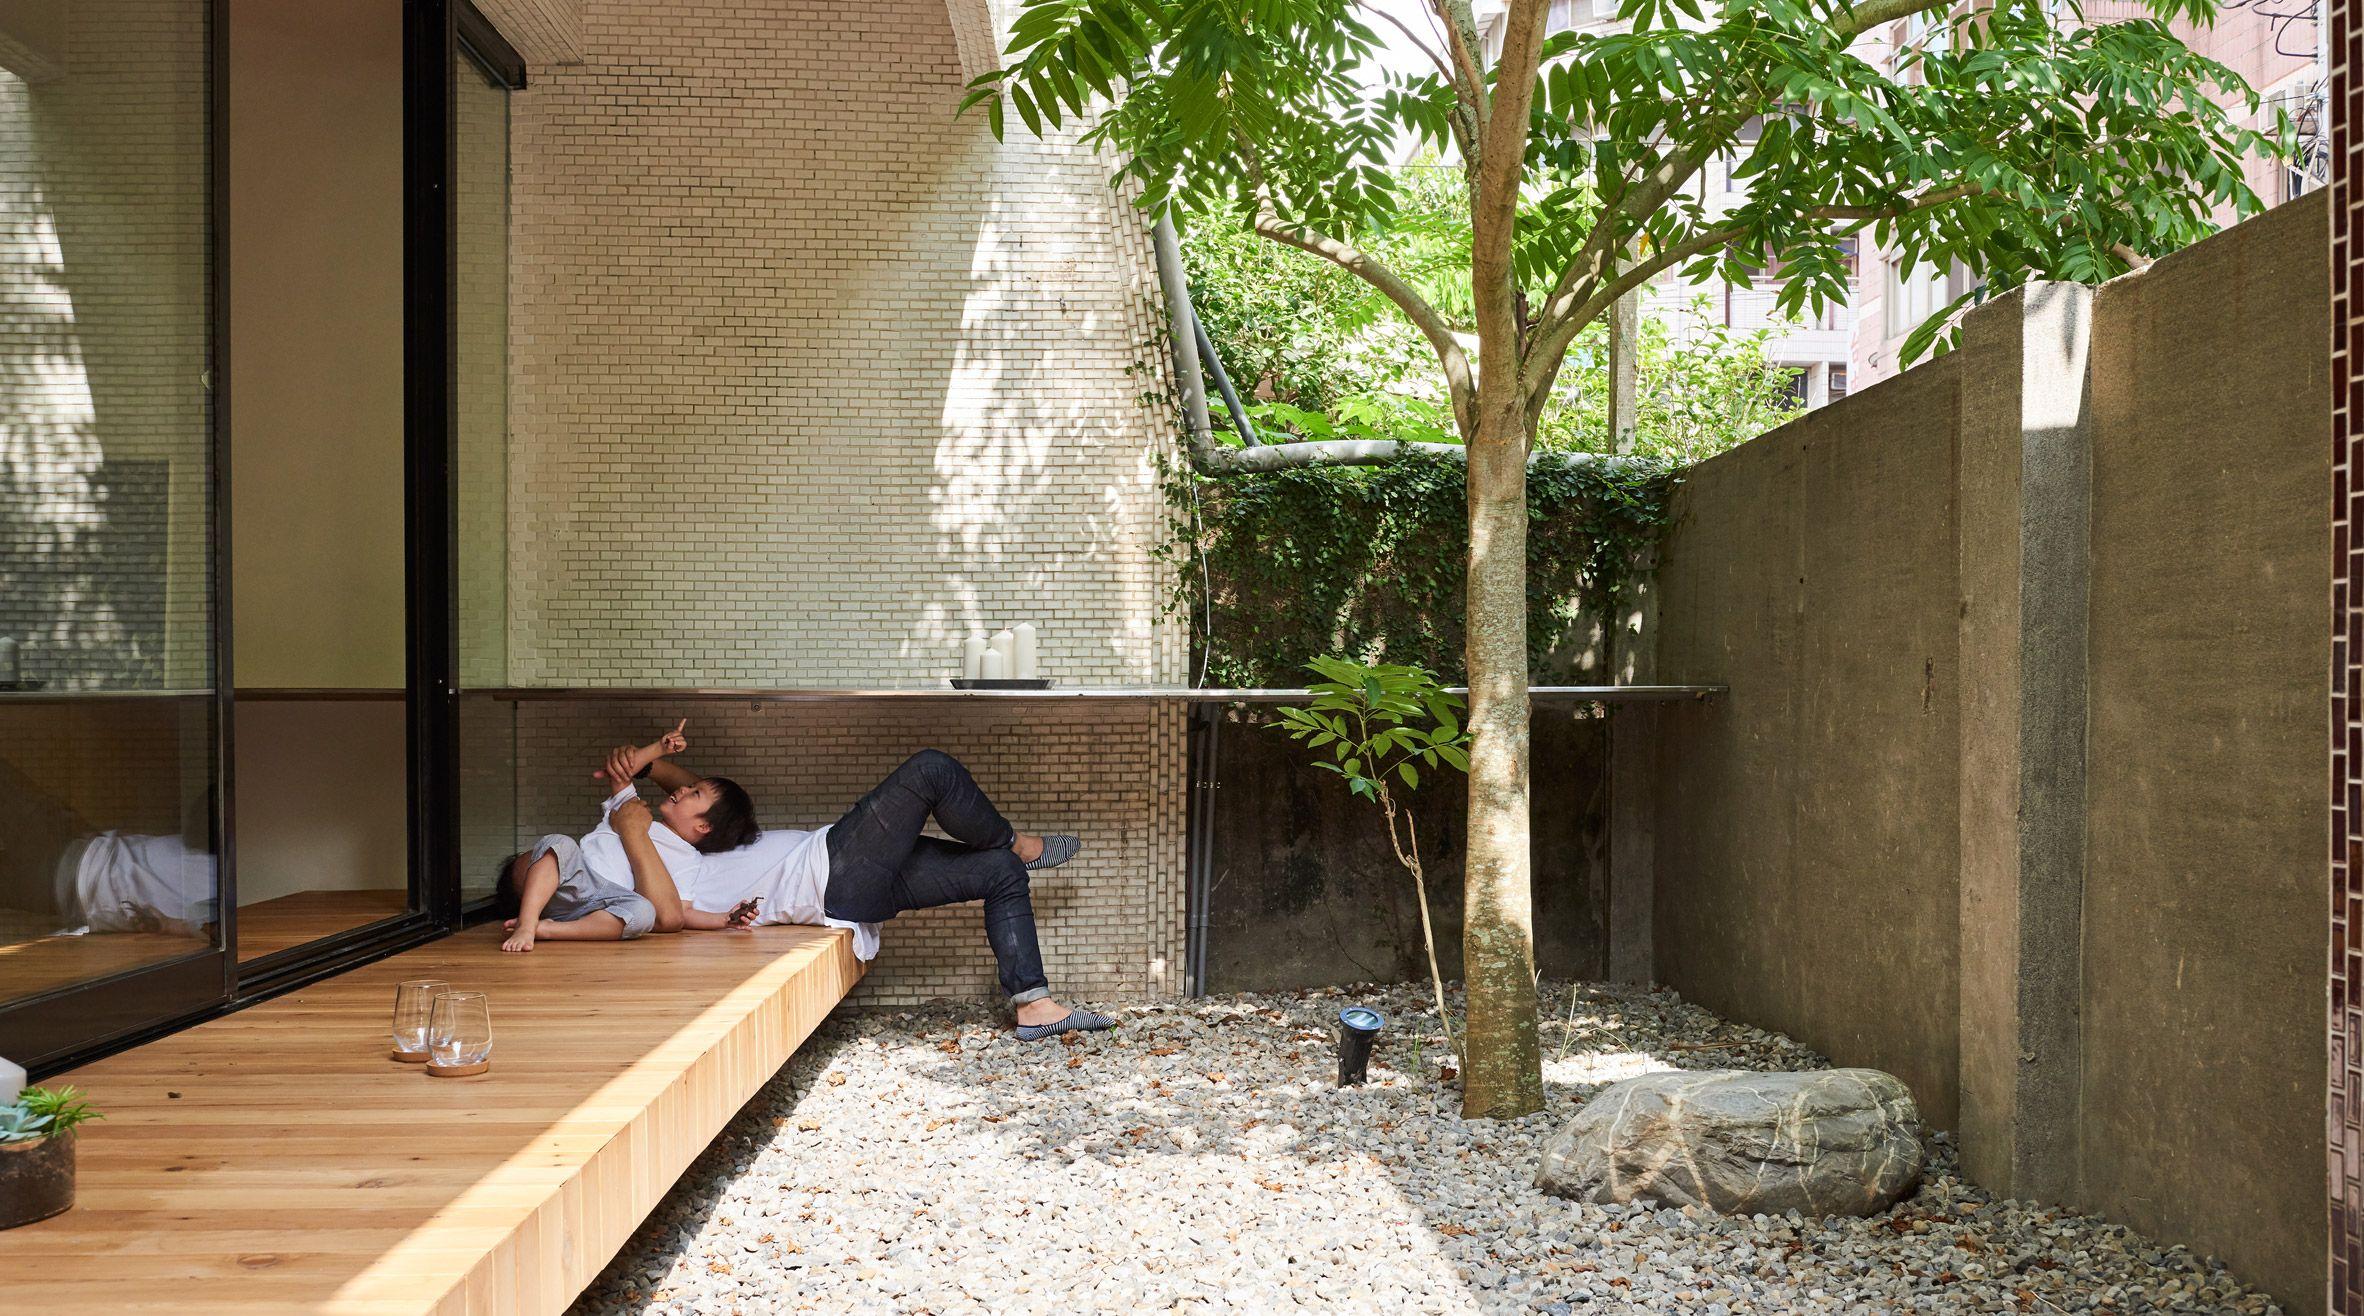 Wabi-Sabi house by Soar Design | Wabi-Sabi | Pinterest | Wabi sabi ...